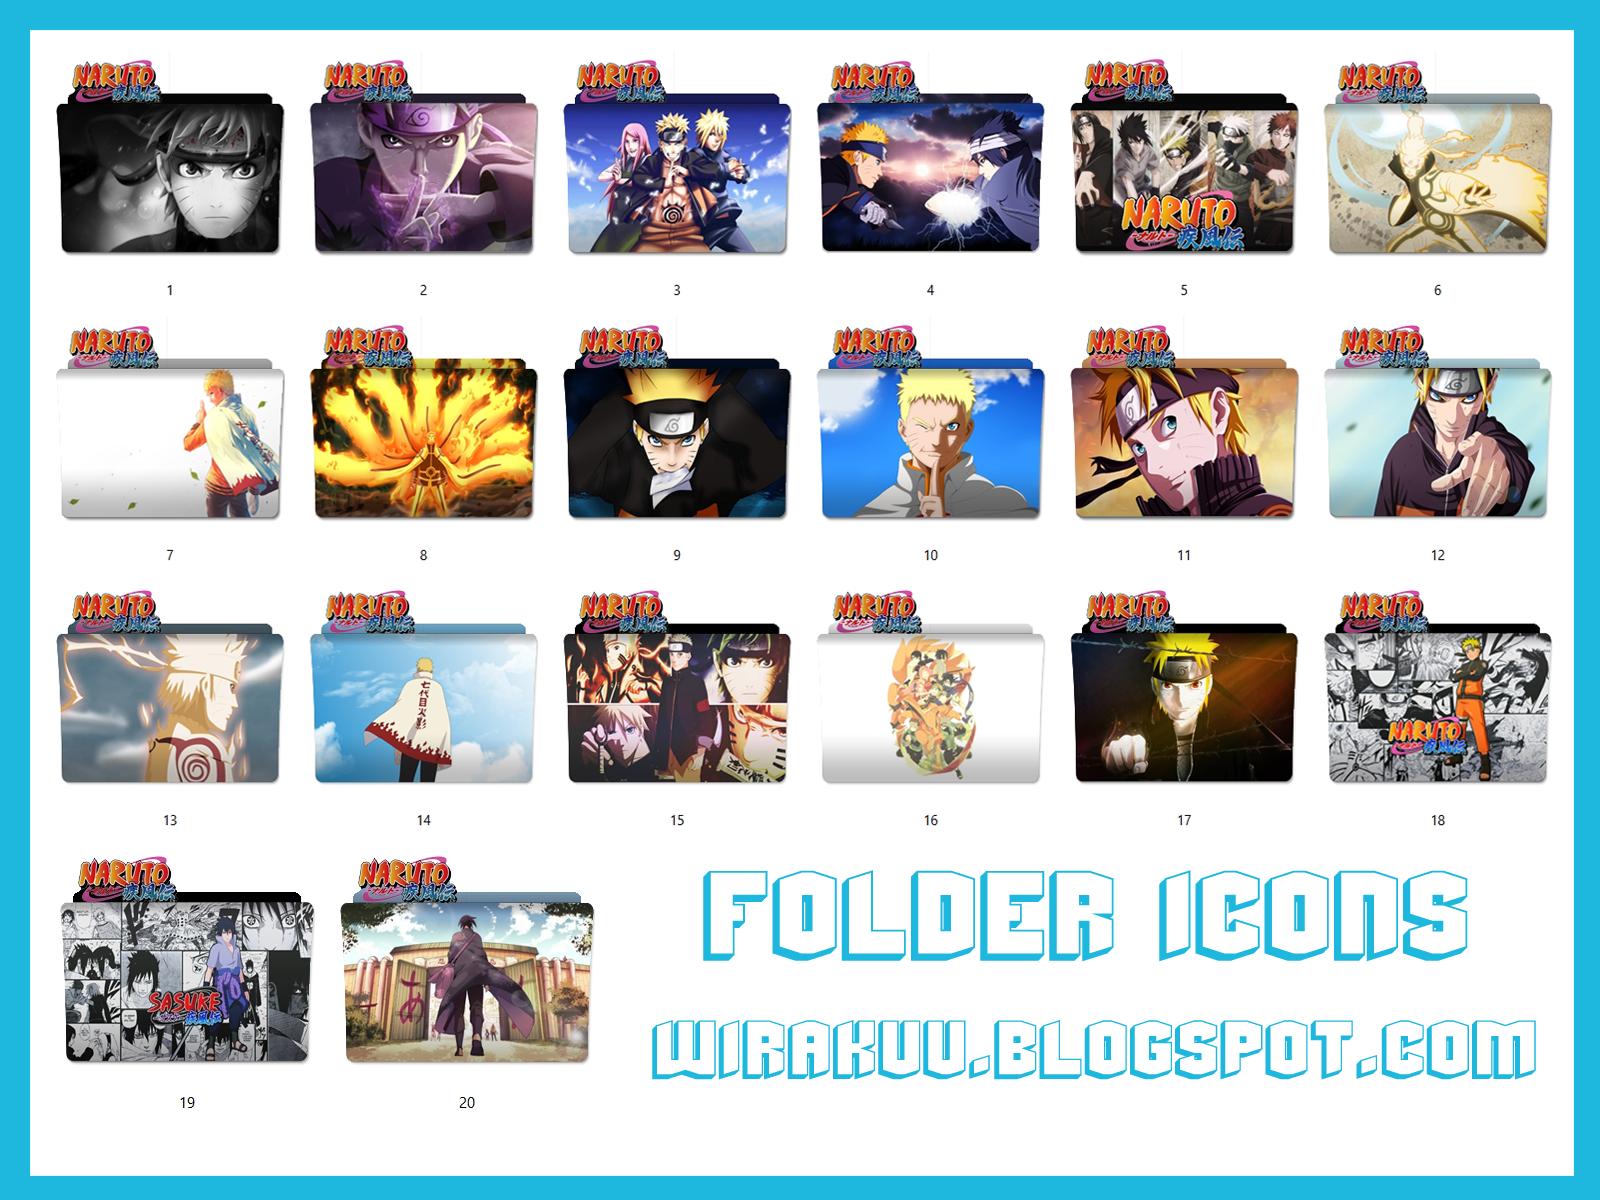 20 Folder Icons Anime Naruto Shippuden (Windows 7, 8, 10)